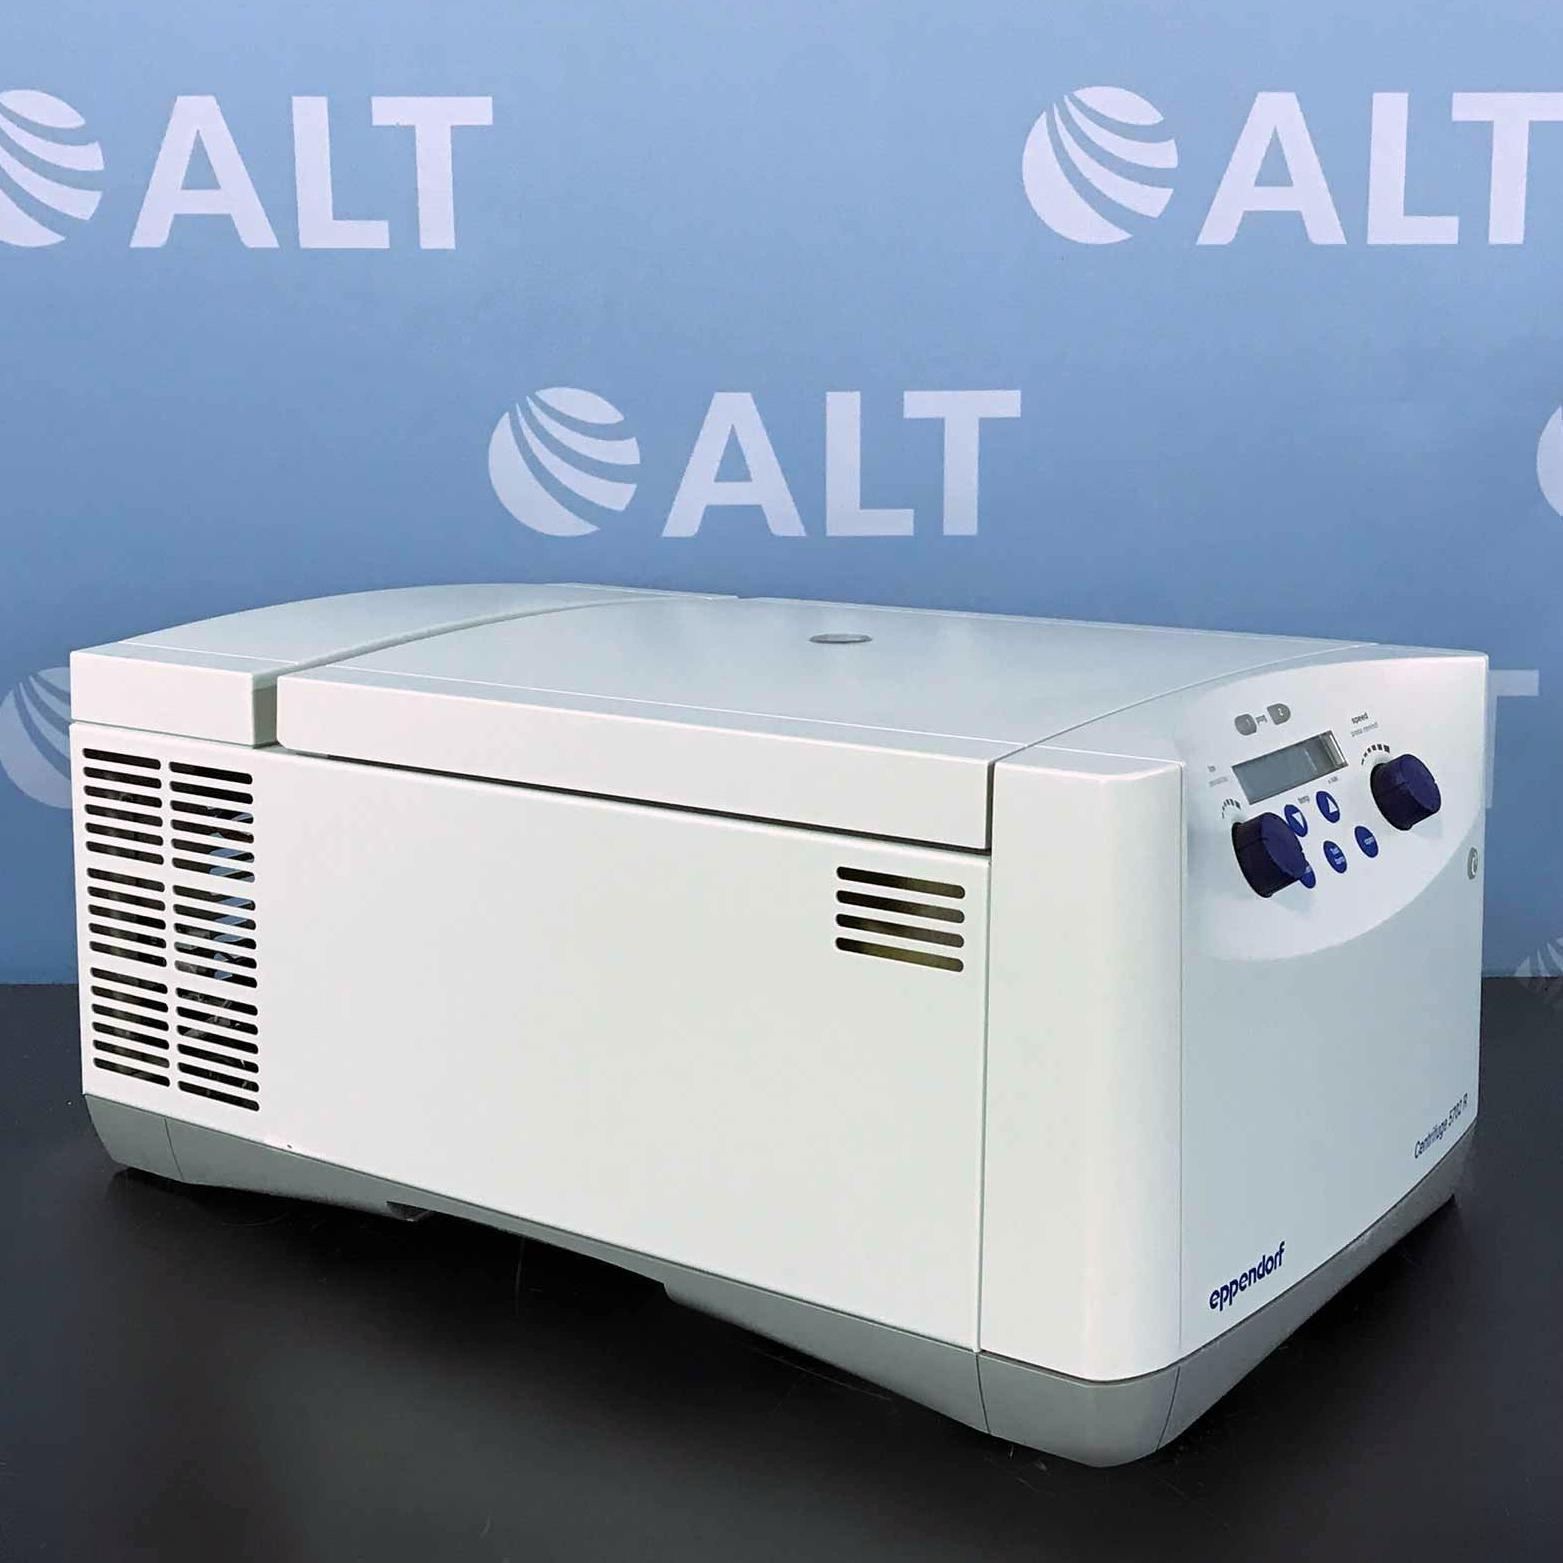 Eppendorf 5702R Refrigerated Benchtop Centrifuge Image